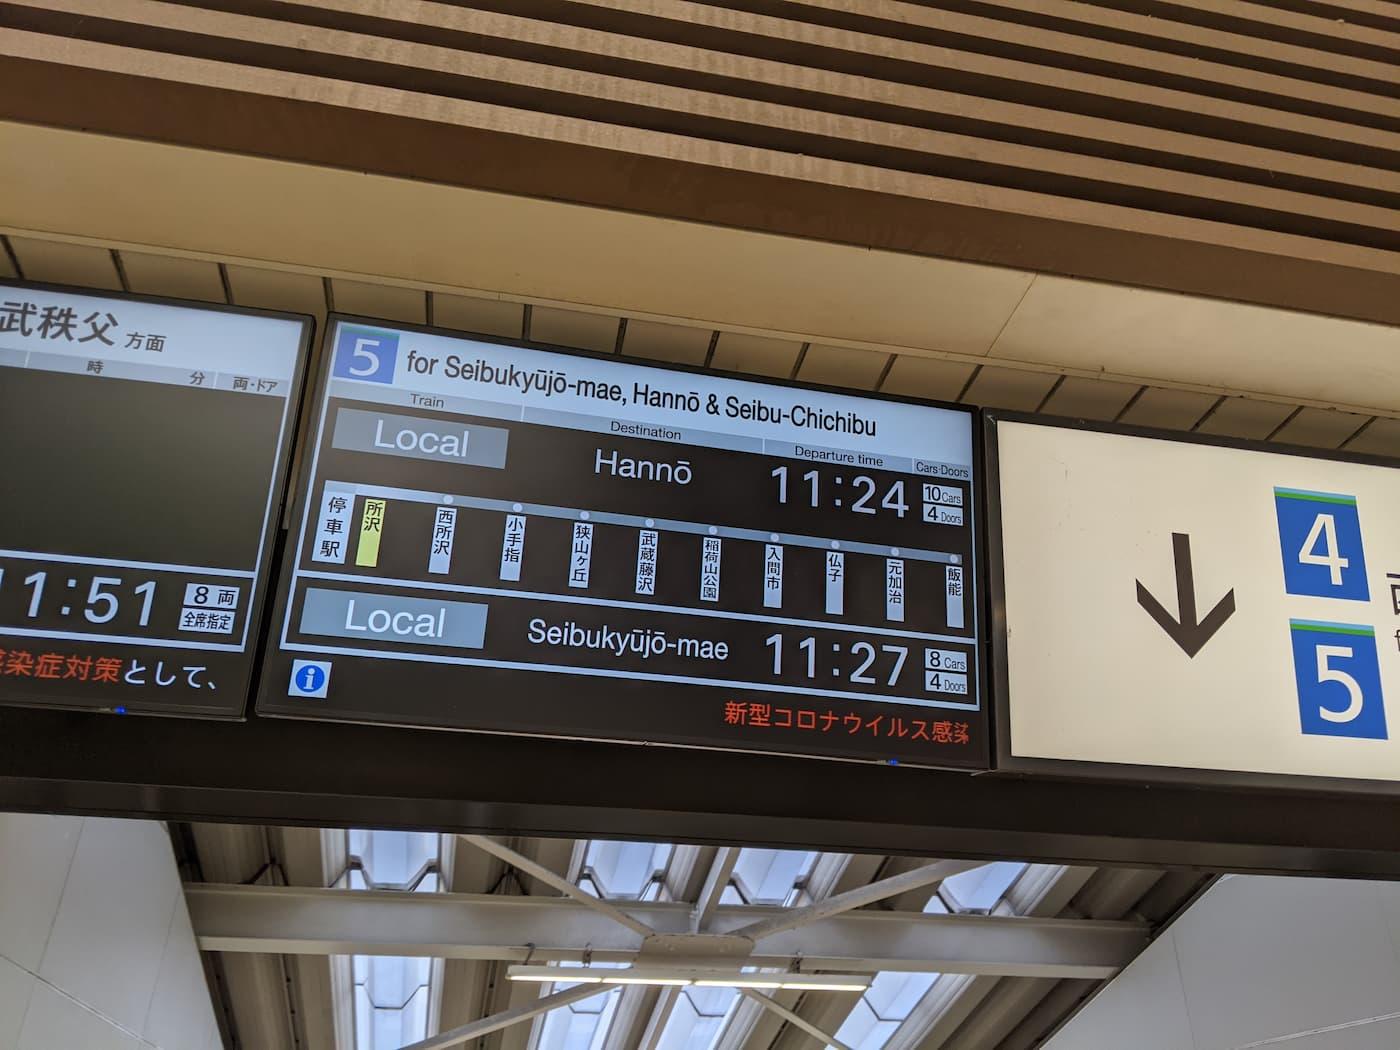 所沢駅の電光版